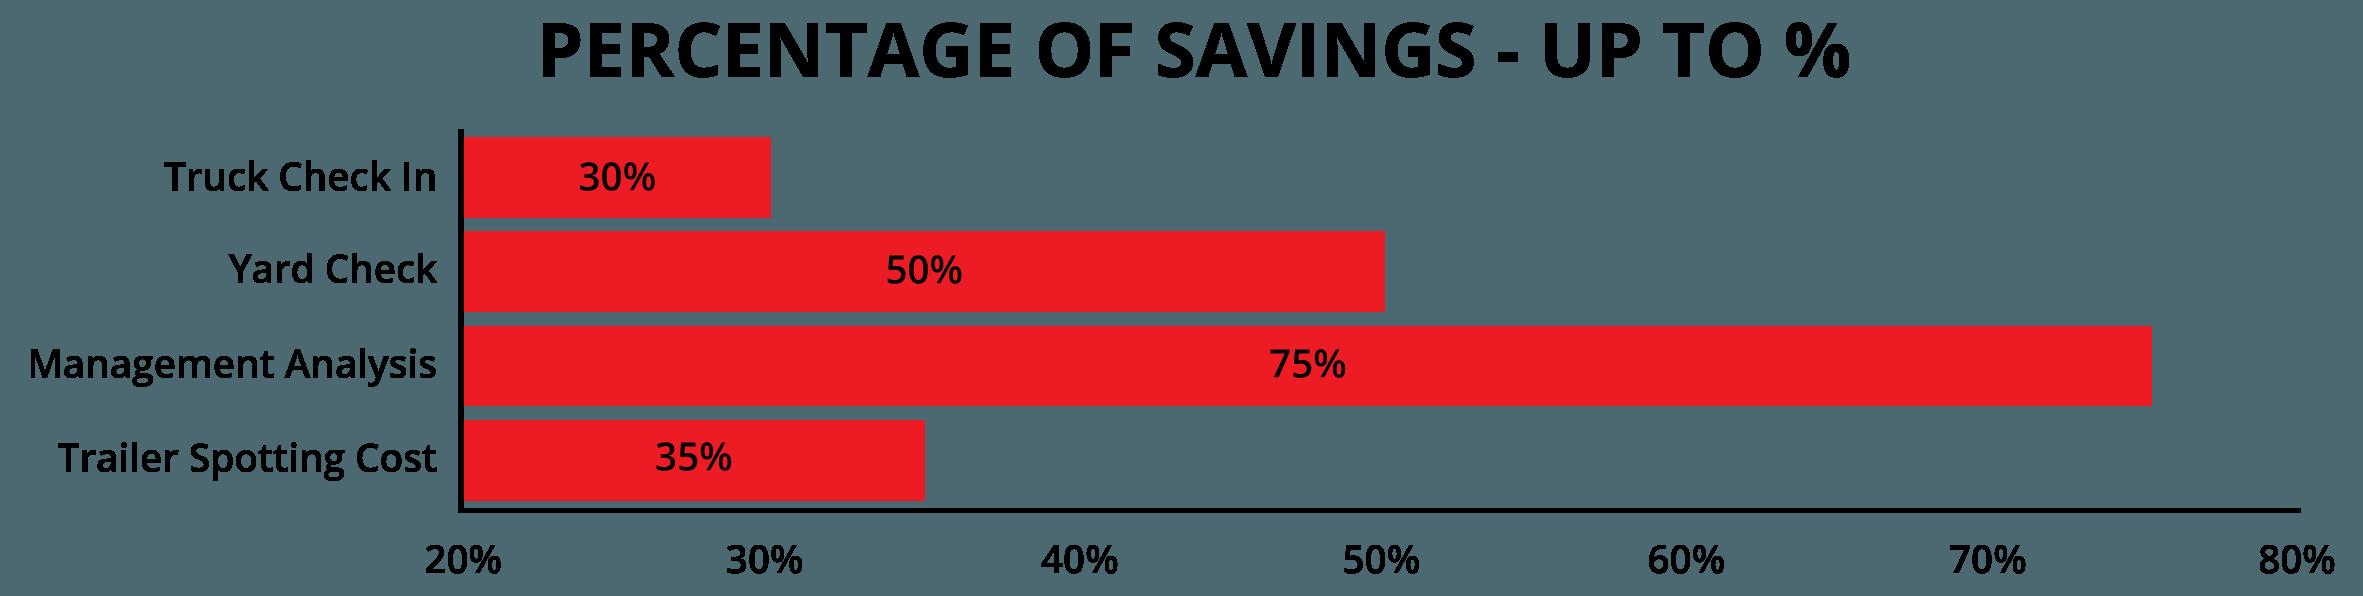 PercentageOfSavings-ChartGraphic